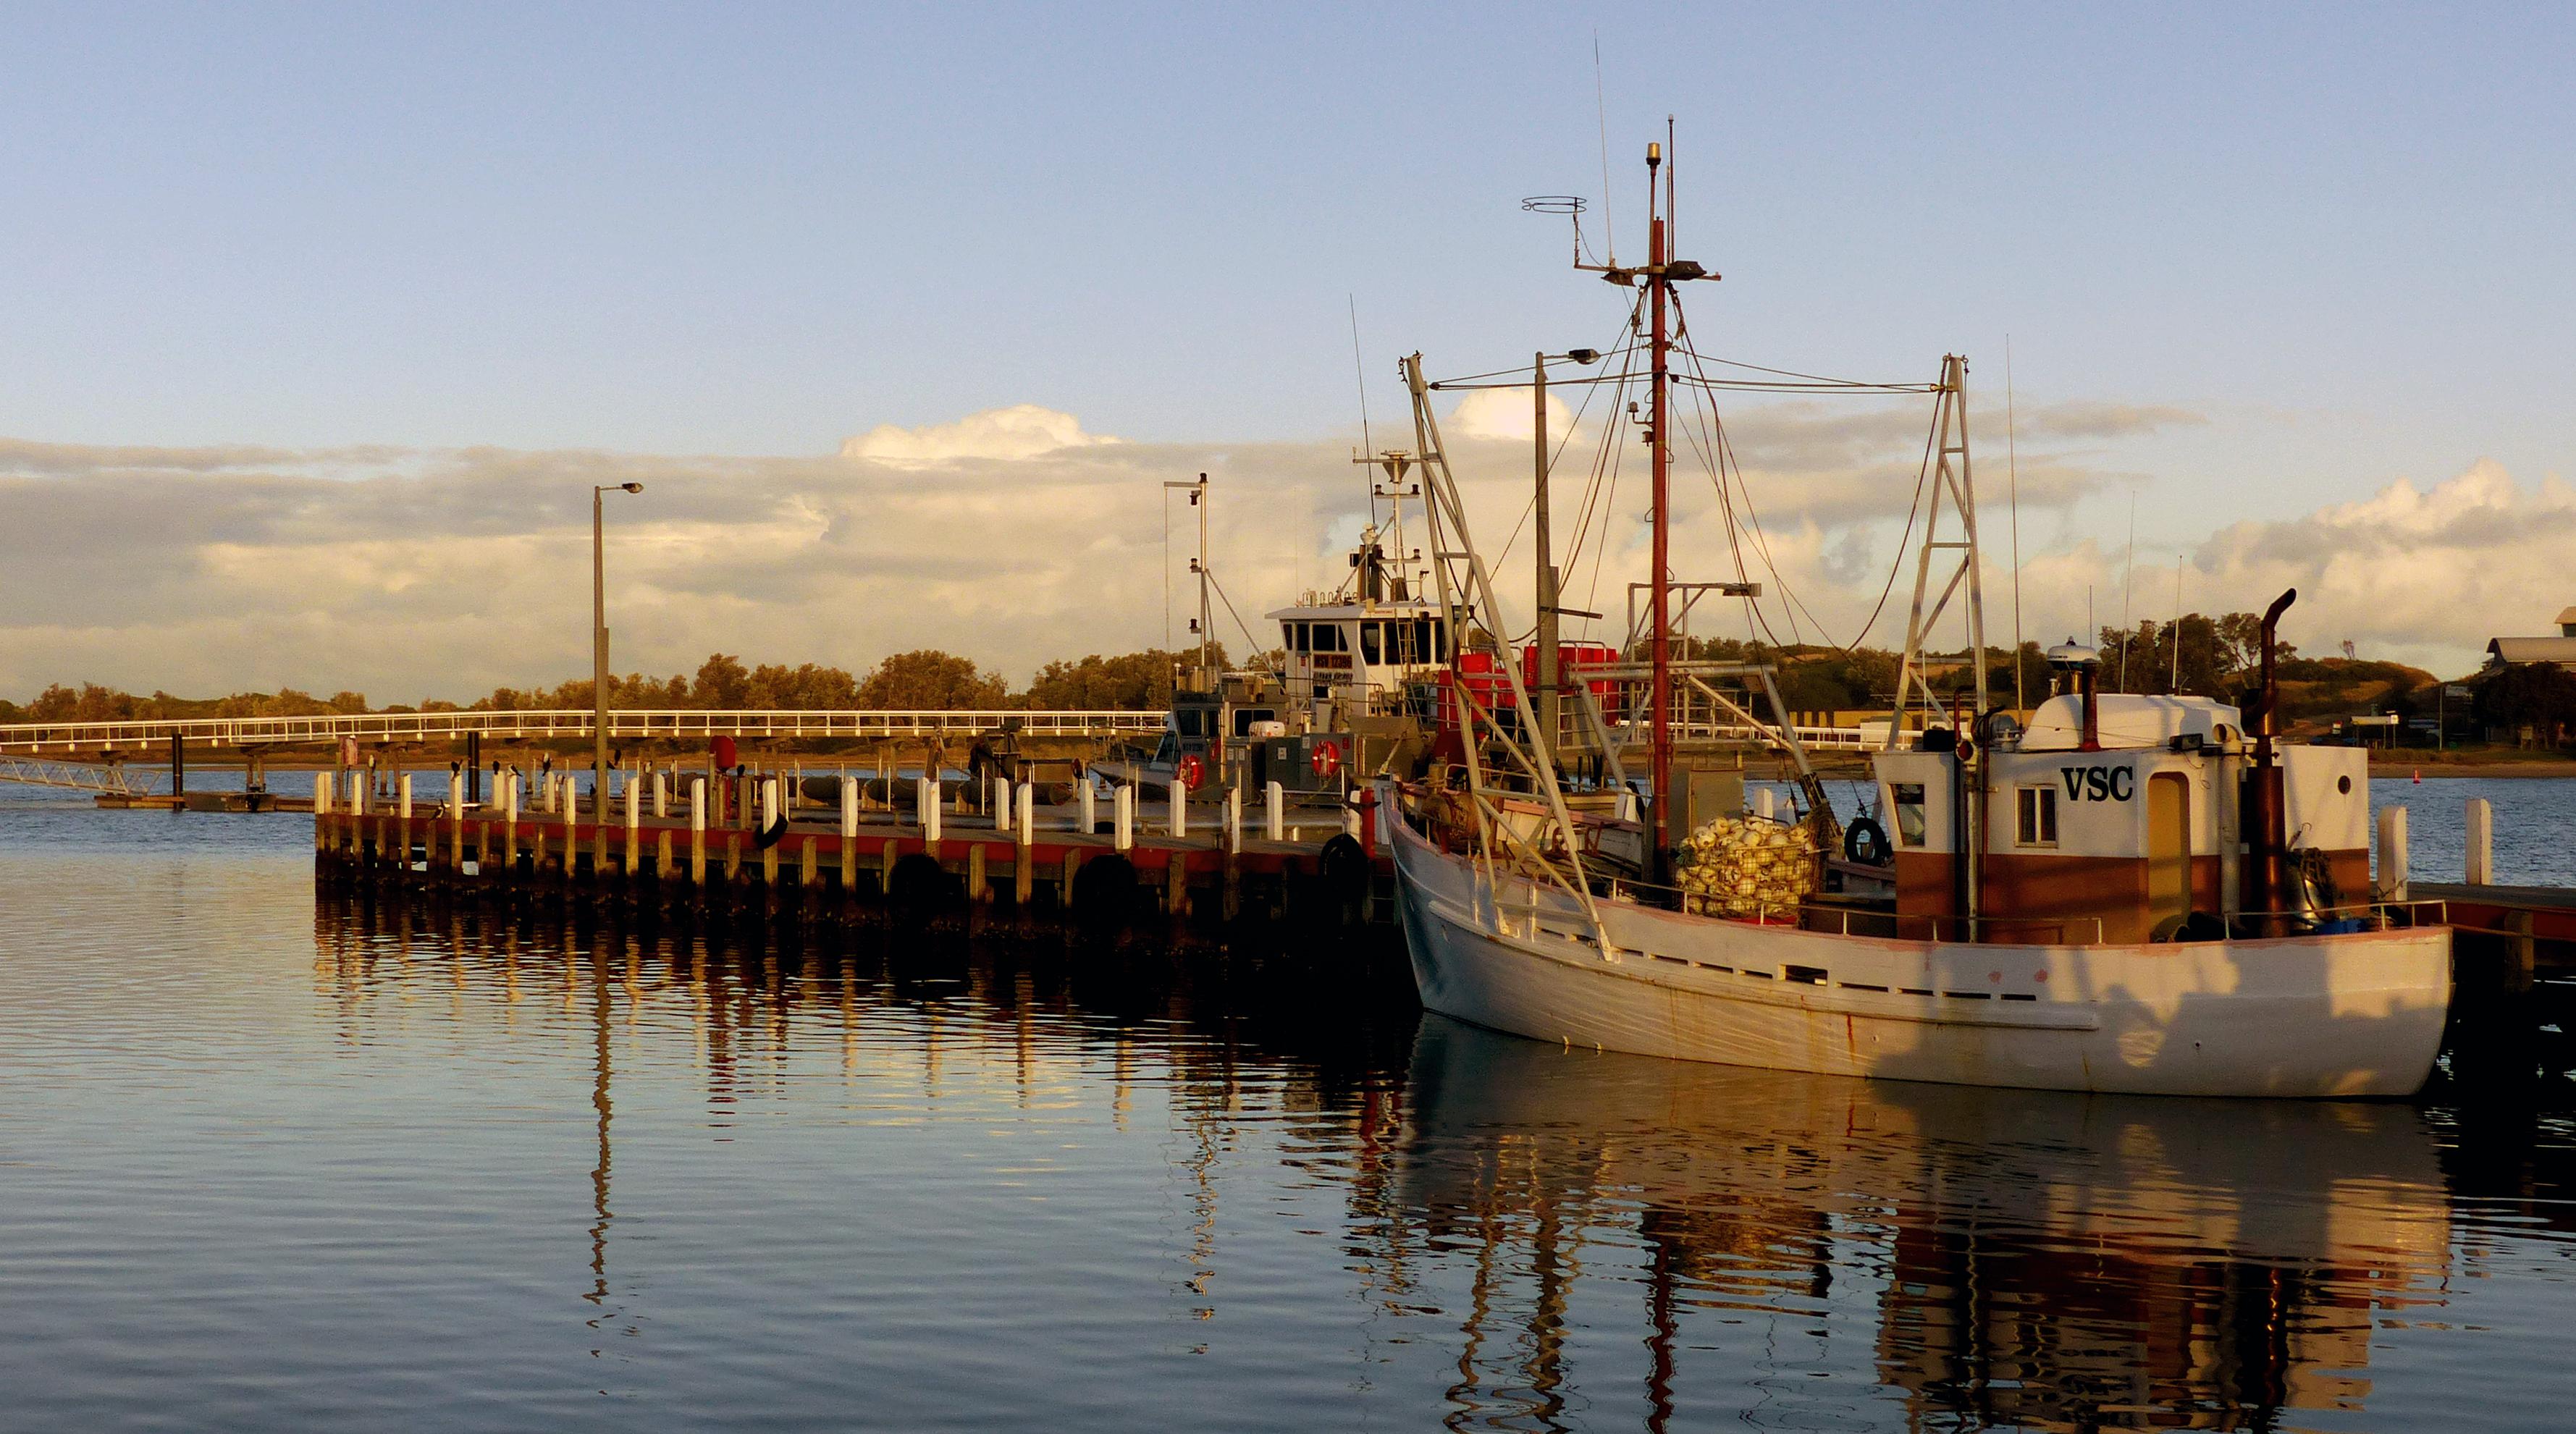 Lakes Entrance.Vic Aust., Australia, Boat, Boats, Fishing, HQ Photo